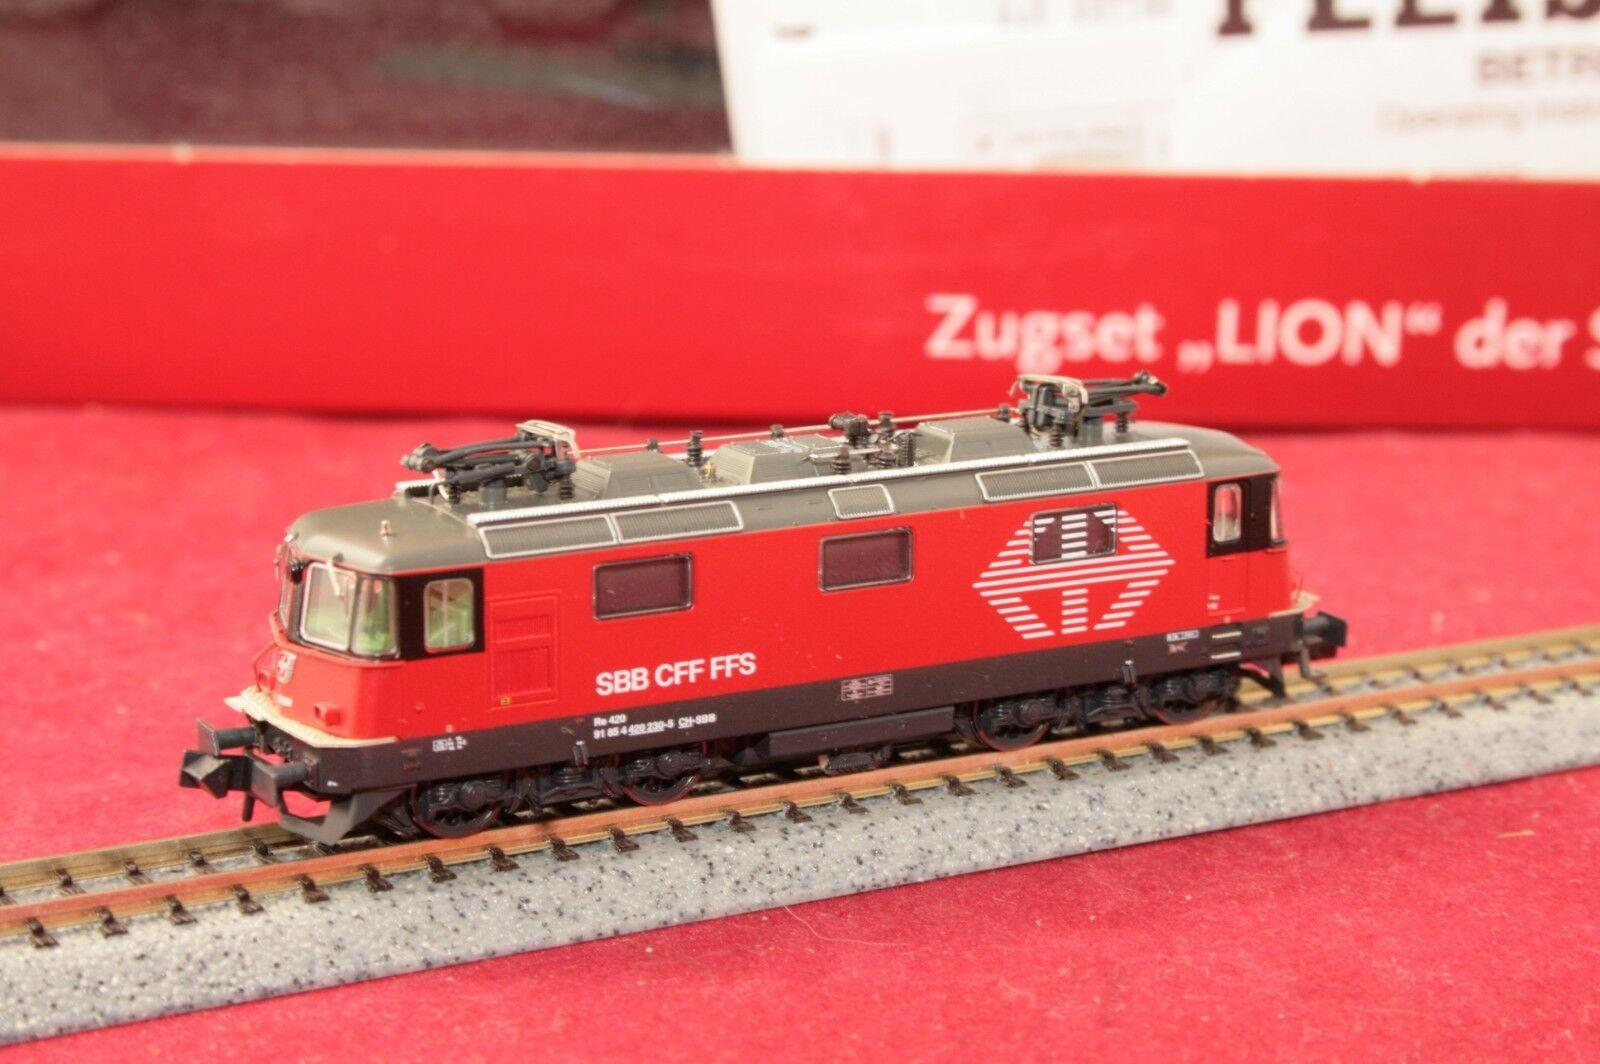 Fleischmann N 734076-1 E-Lok re4/4 420 230-5  Lion  digitale/SUONO + LUCE DI CAMBIO/NUOVO